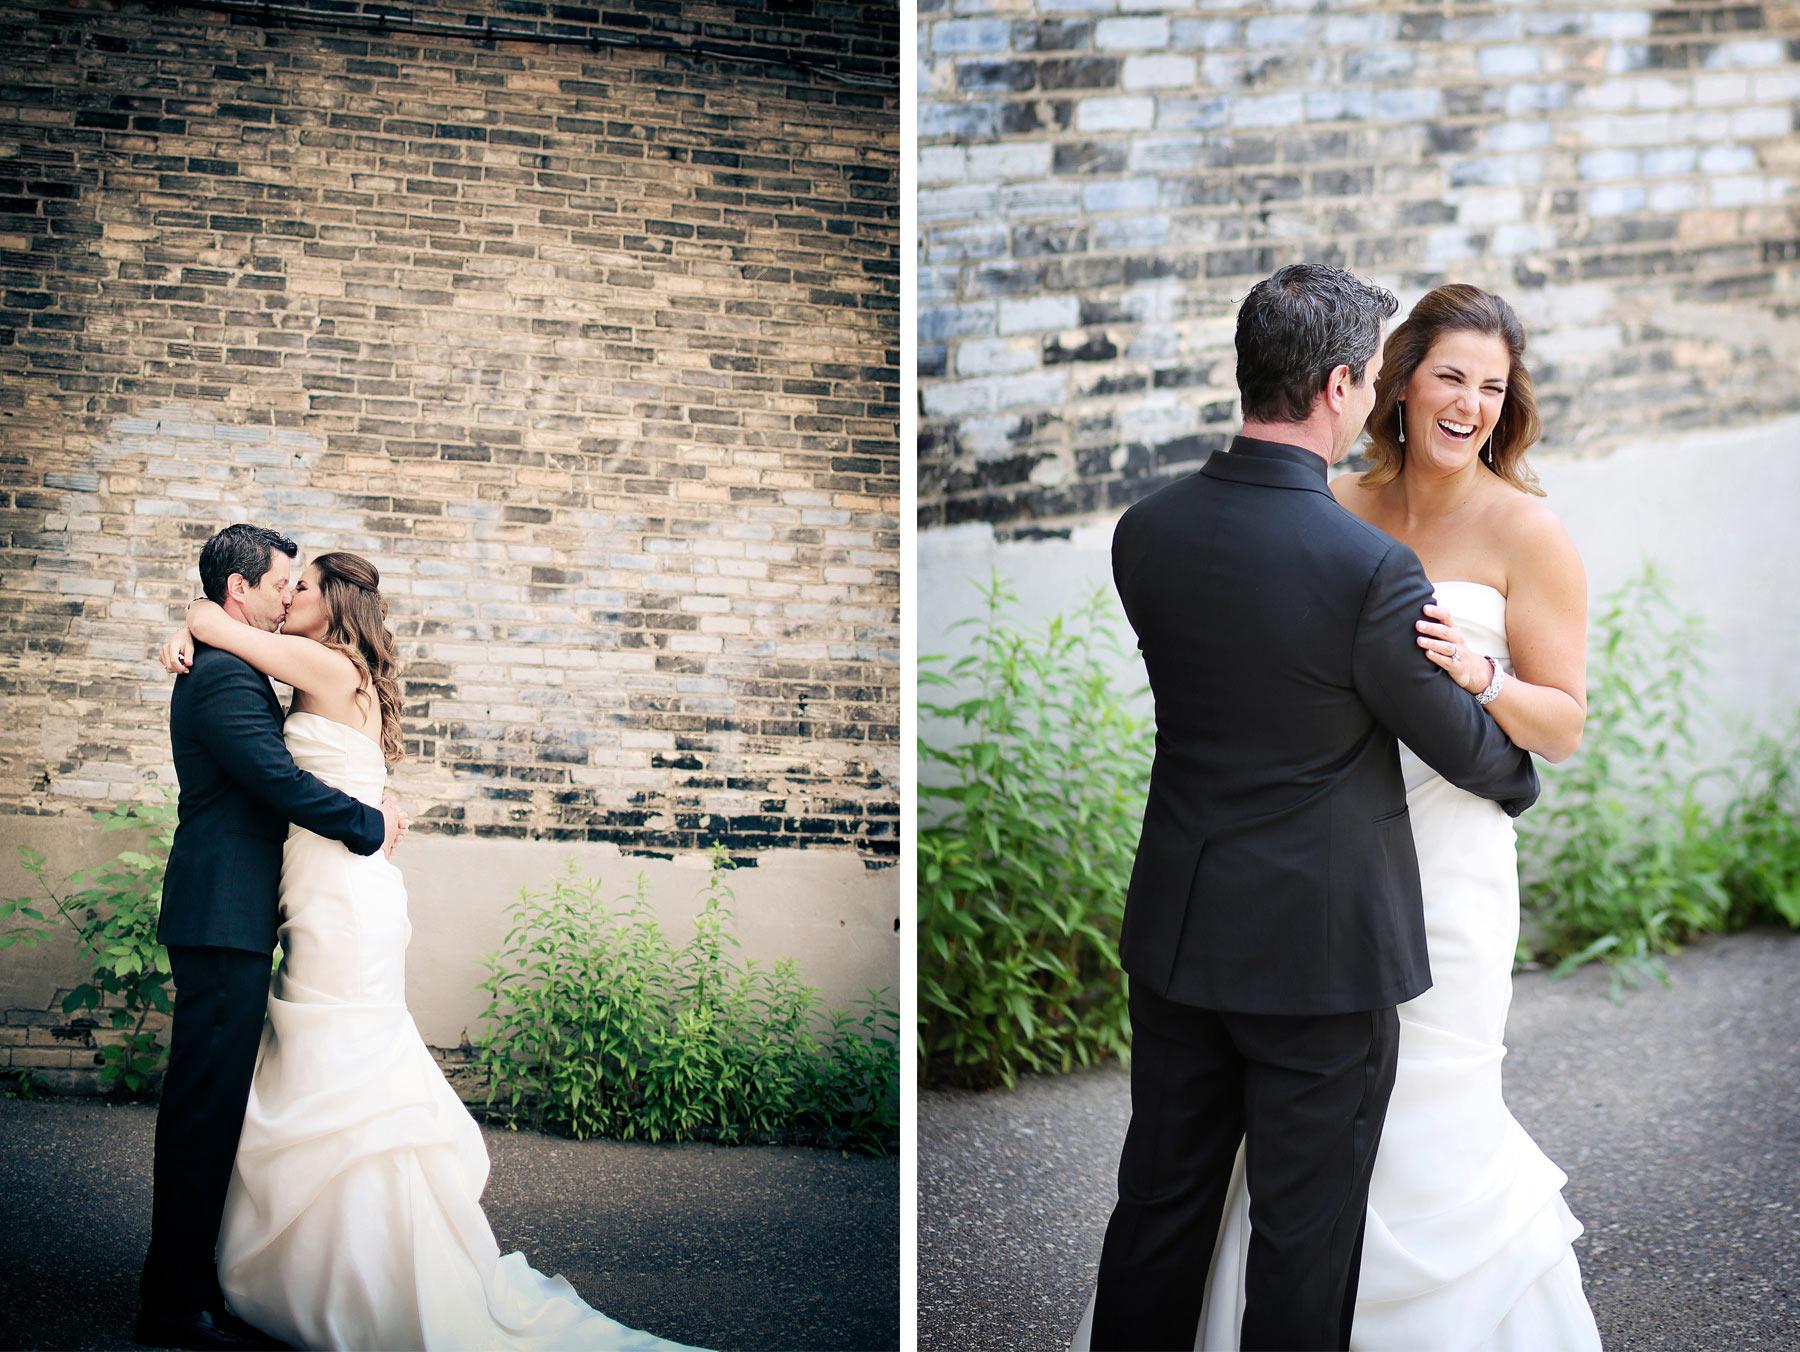 03-Minneapolis-Minnesota-Wedding-Photography-by-Vick-Photography-Aria-Downtown-First-Look-Layne-&-Dan.jpg